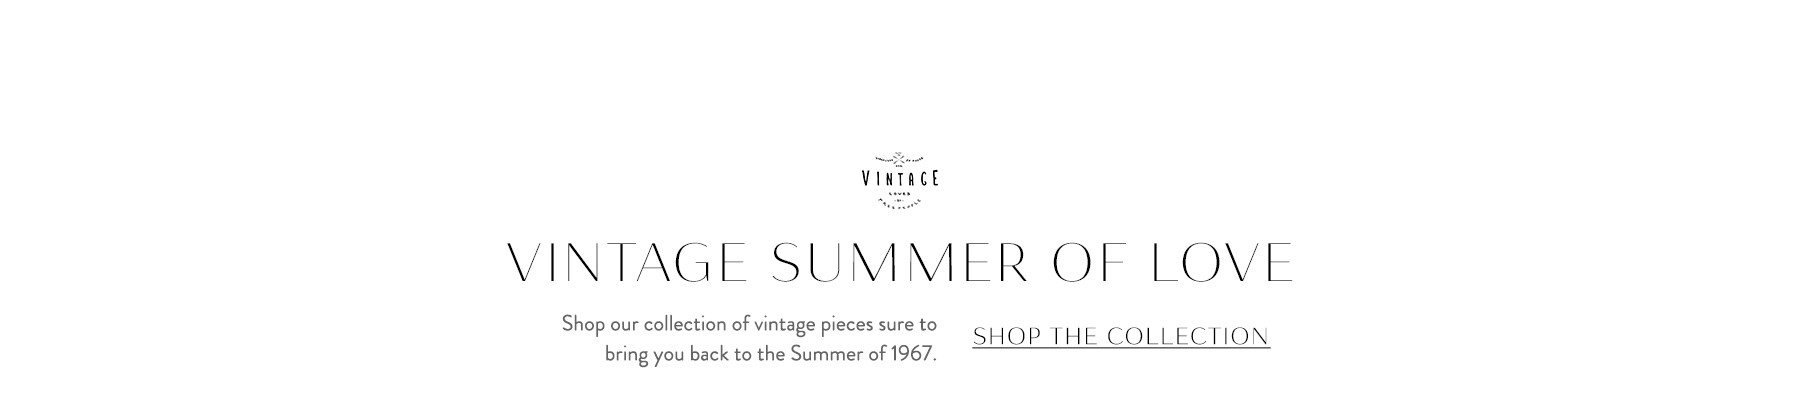 Shop the Vintage Summer of Love Lookbook